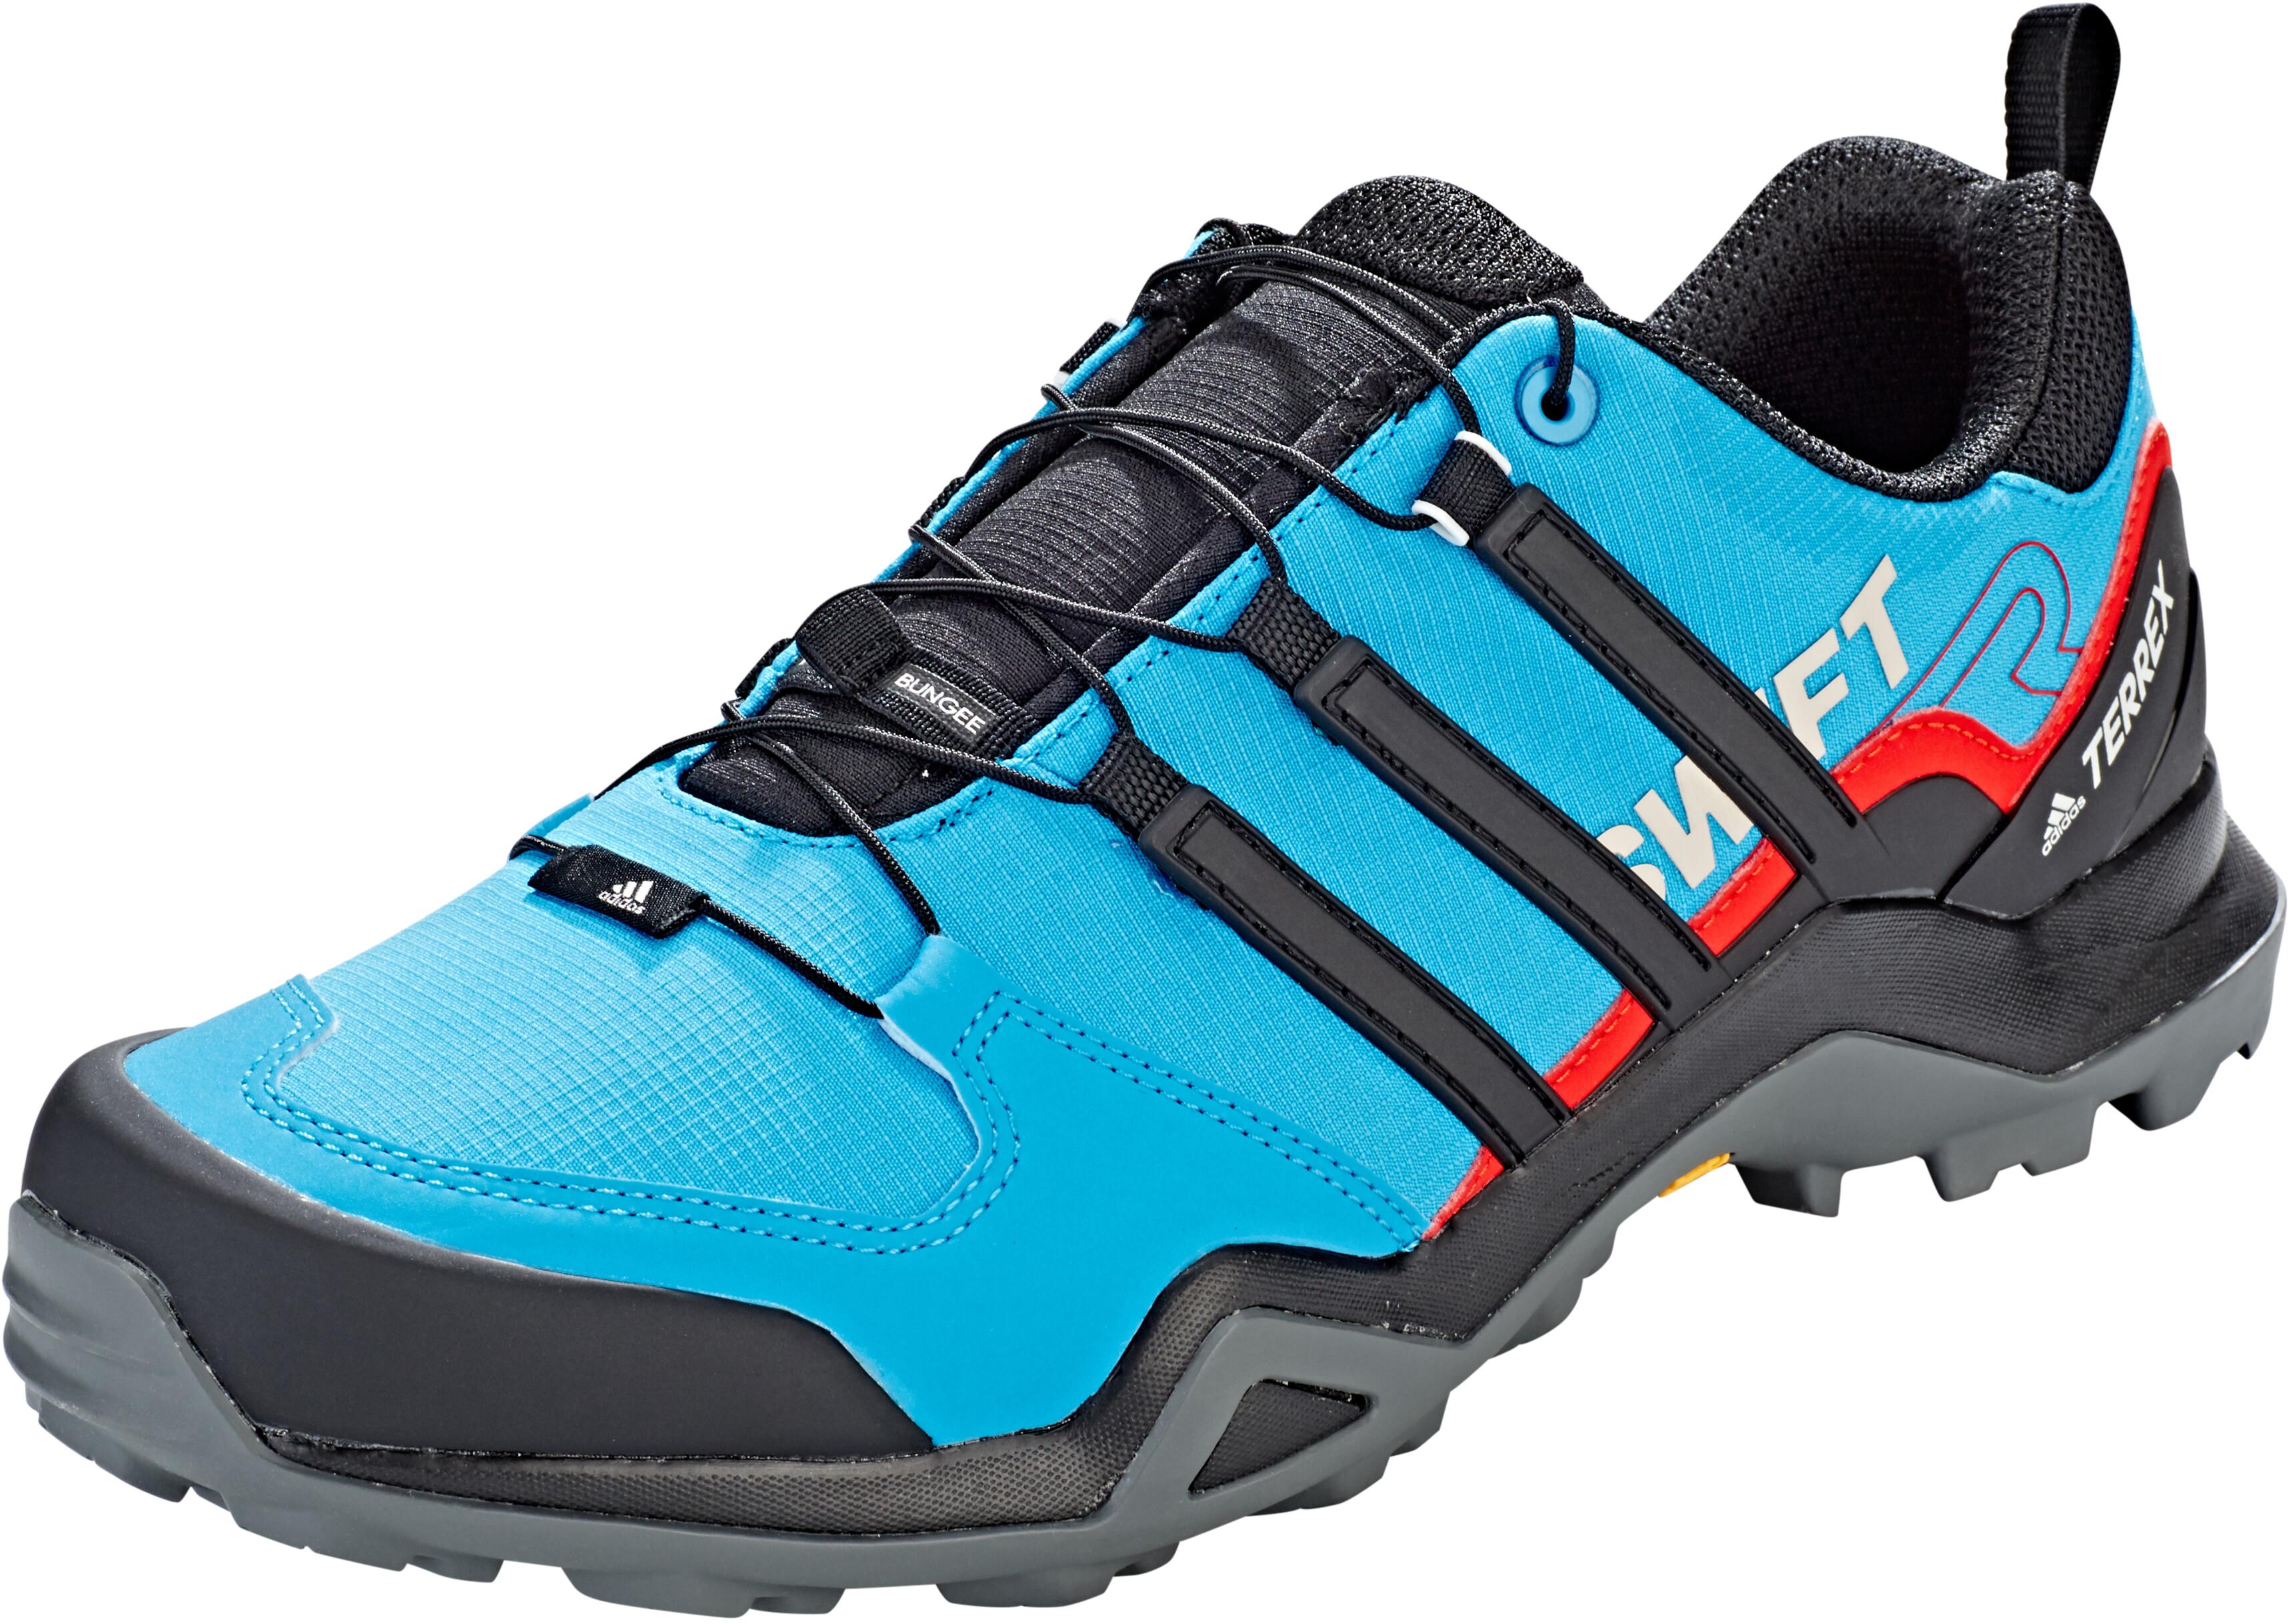 separation shoes 28e37 79b21 adidas TERREX Swift R2 Shoes Men shock cyan/core black/active red